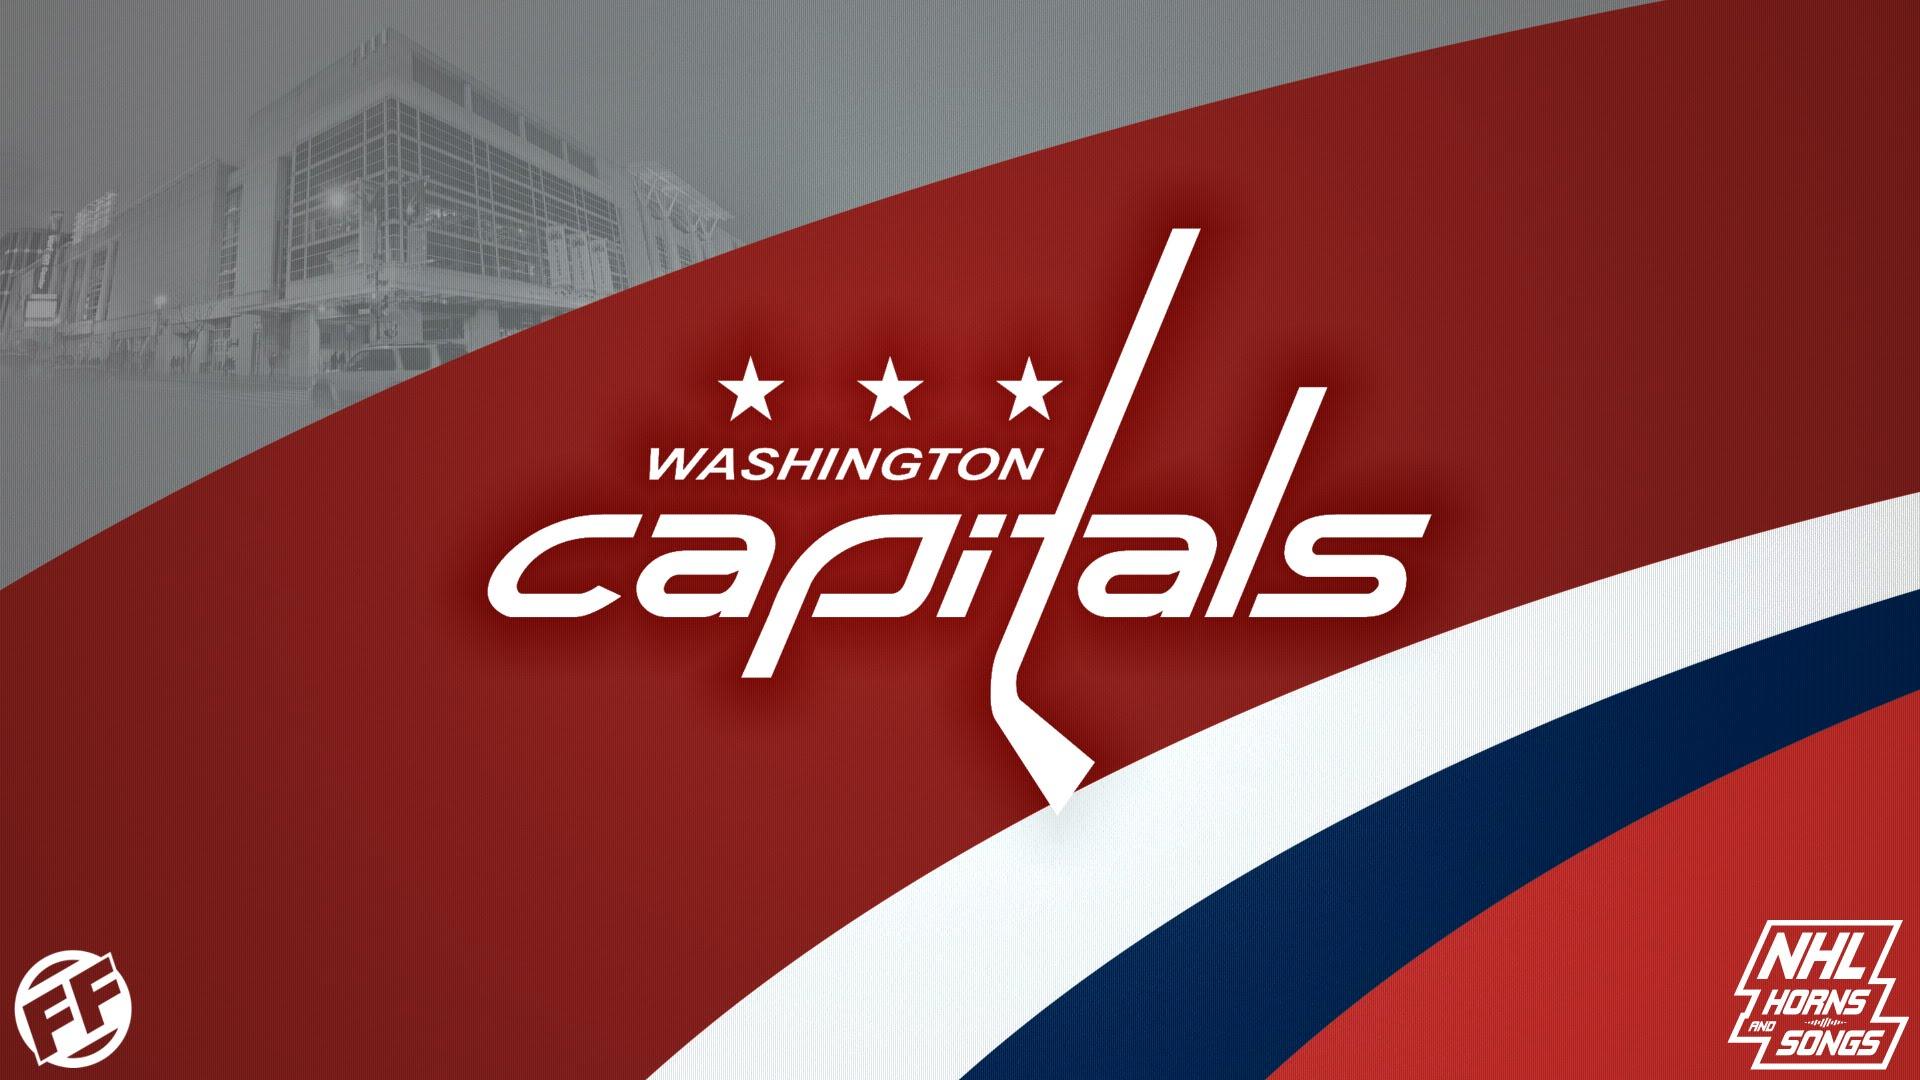 Ultra HD Washington Capitals Wallpapers P8J6DK3   4USkY 1920x1080